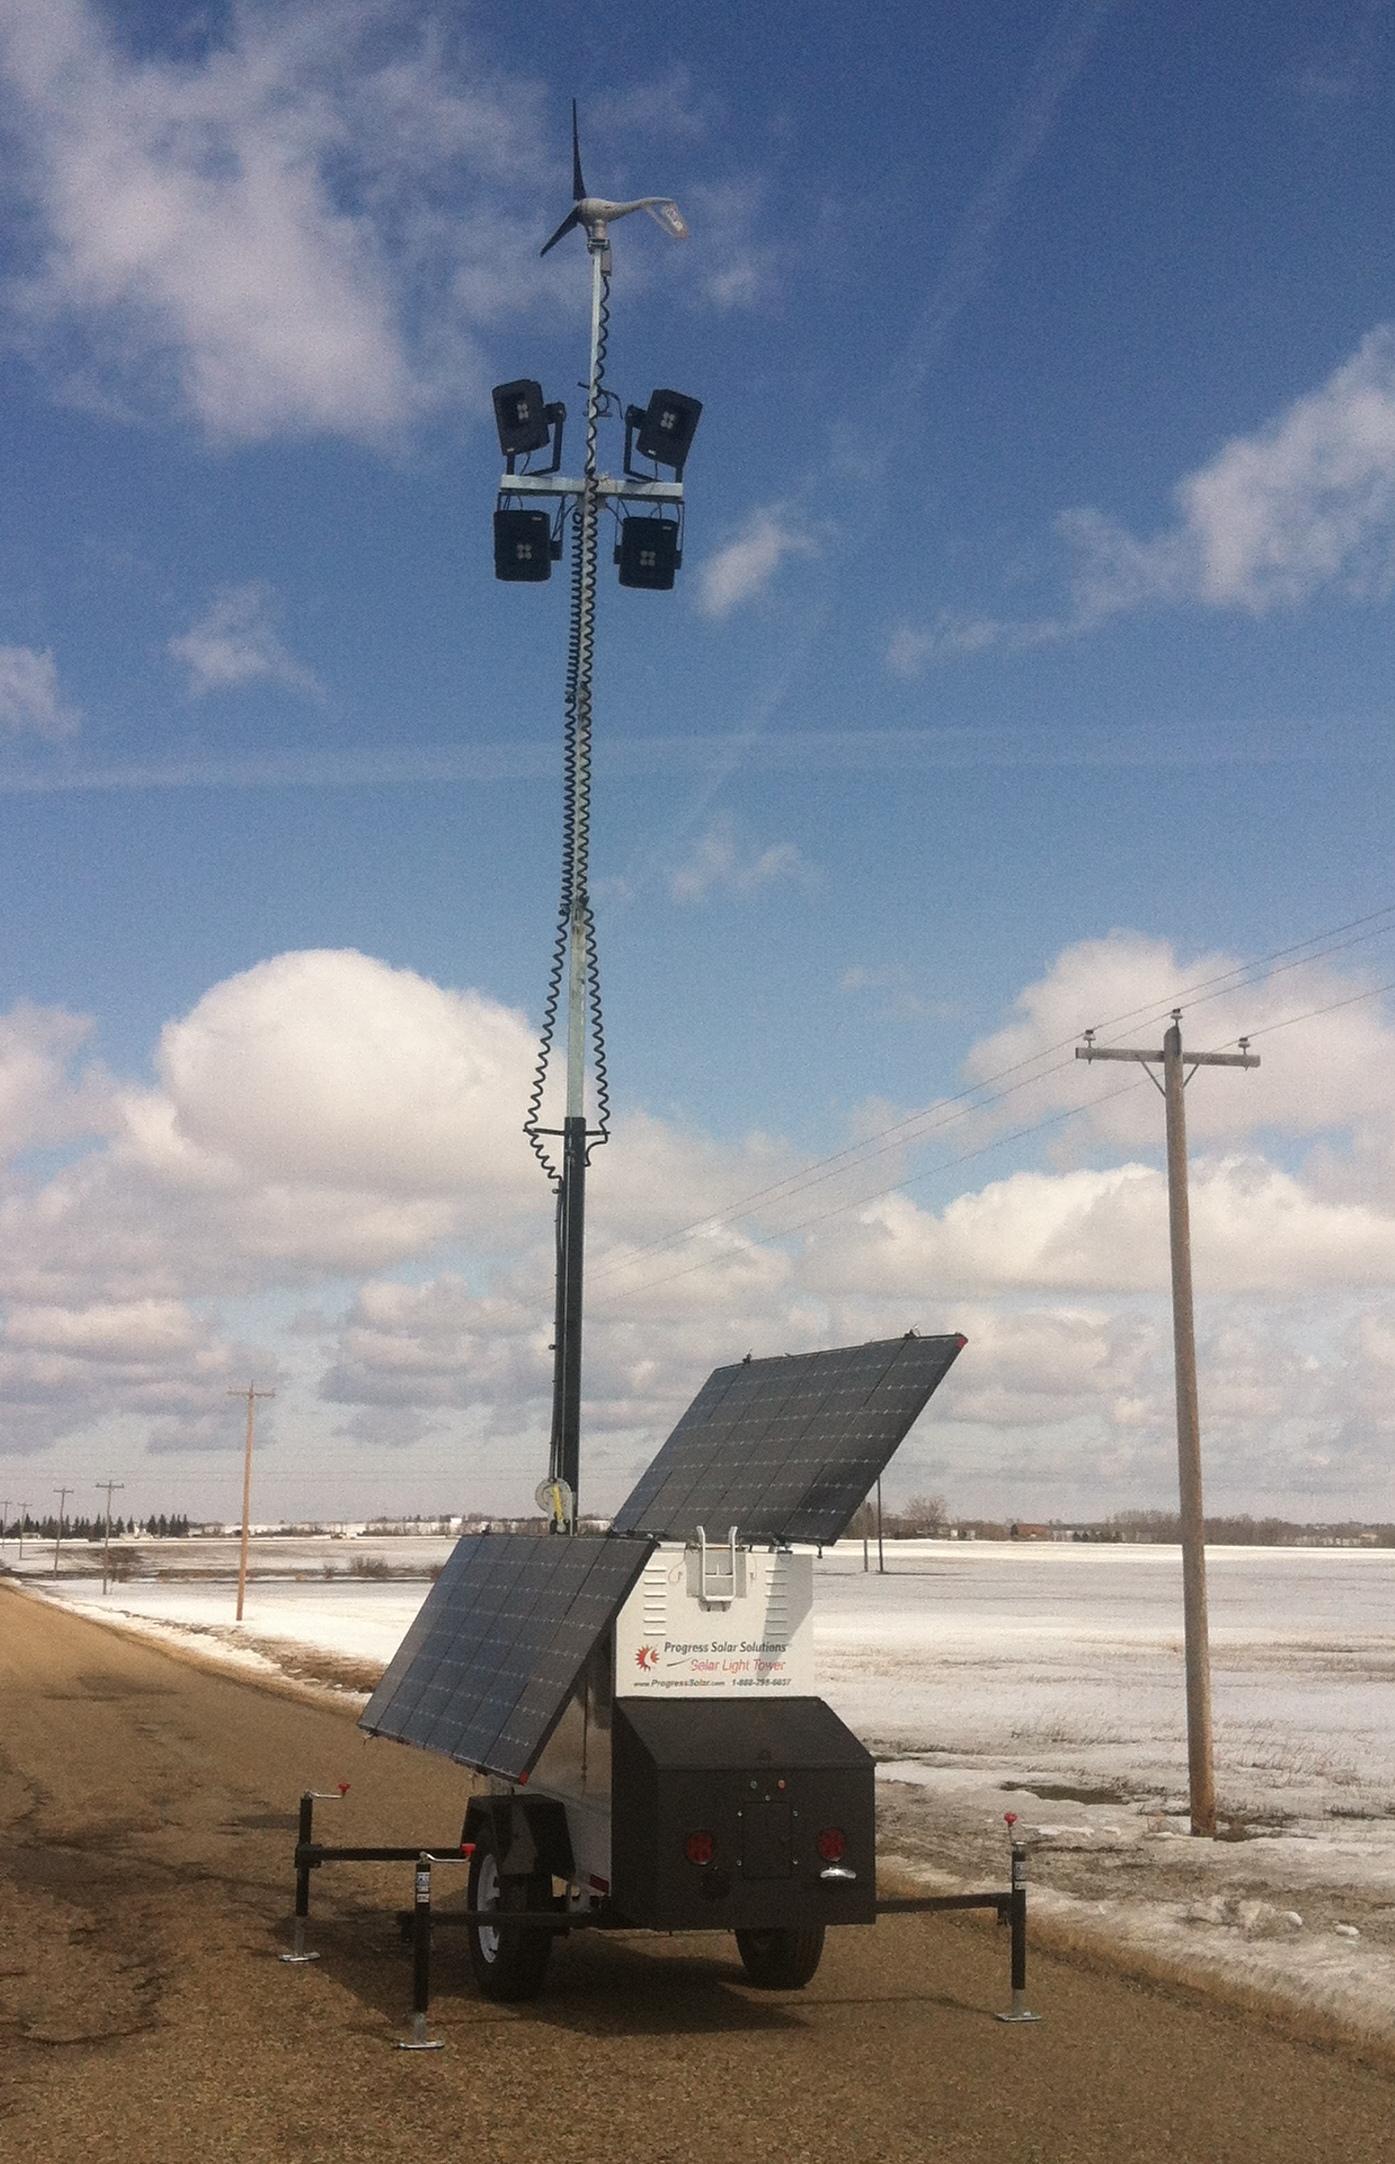 New Progress Solar Hybrid Ready And Progress Solar Hybrid